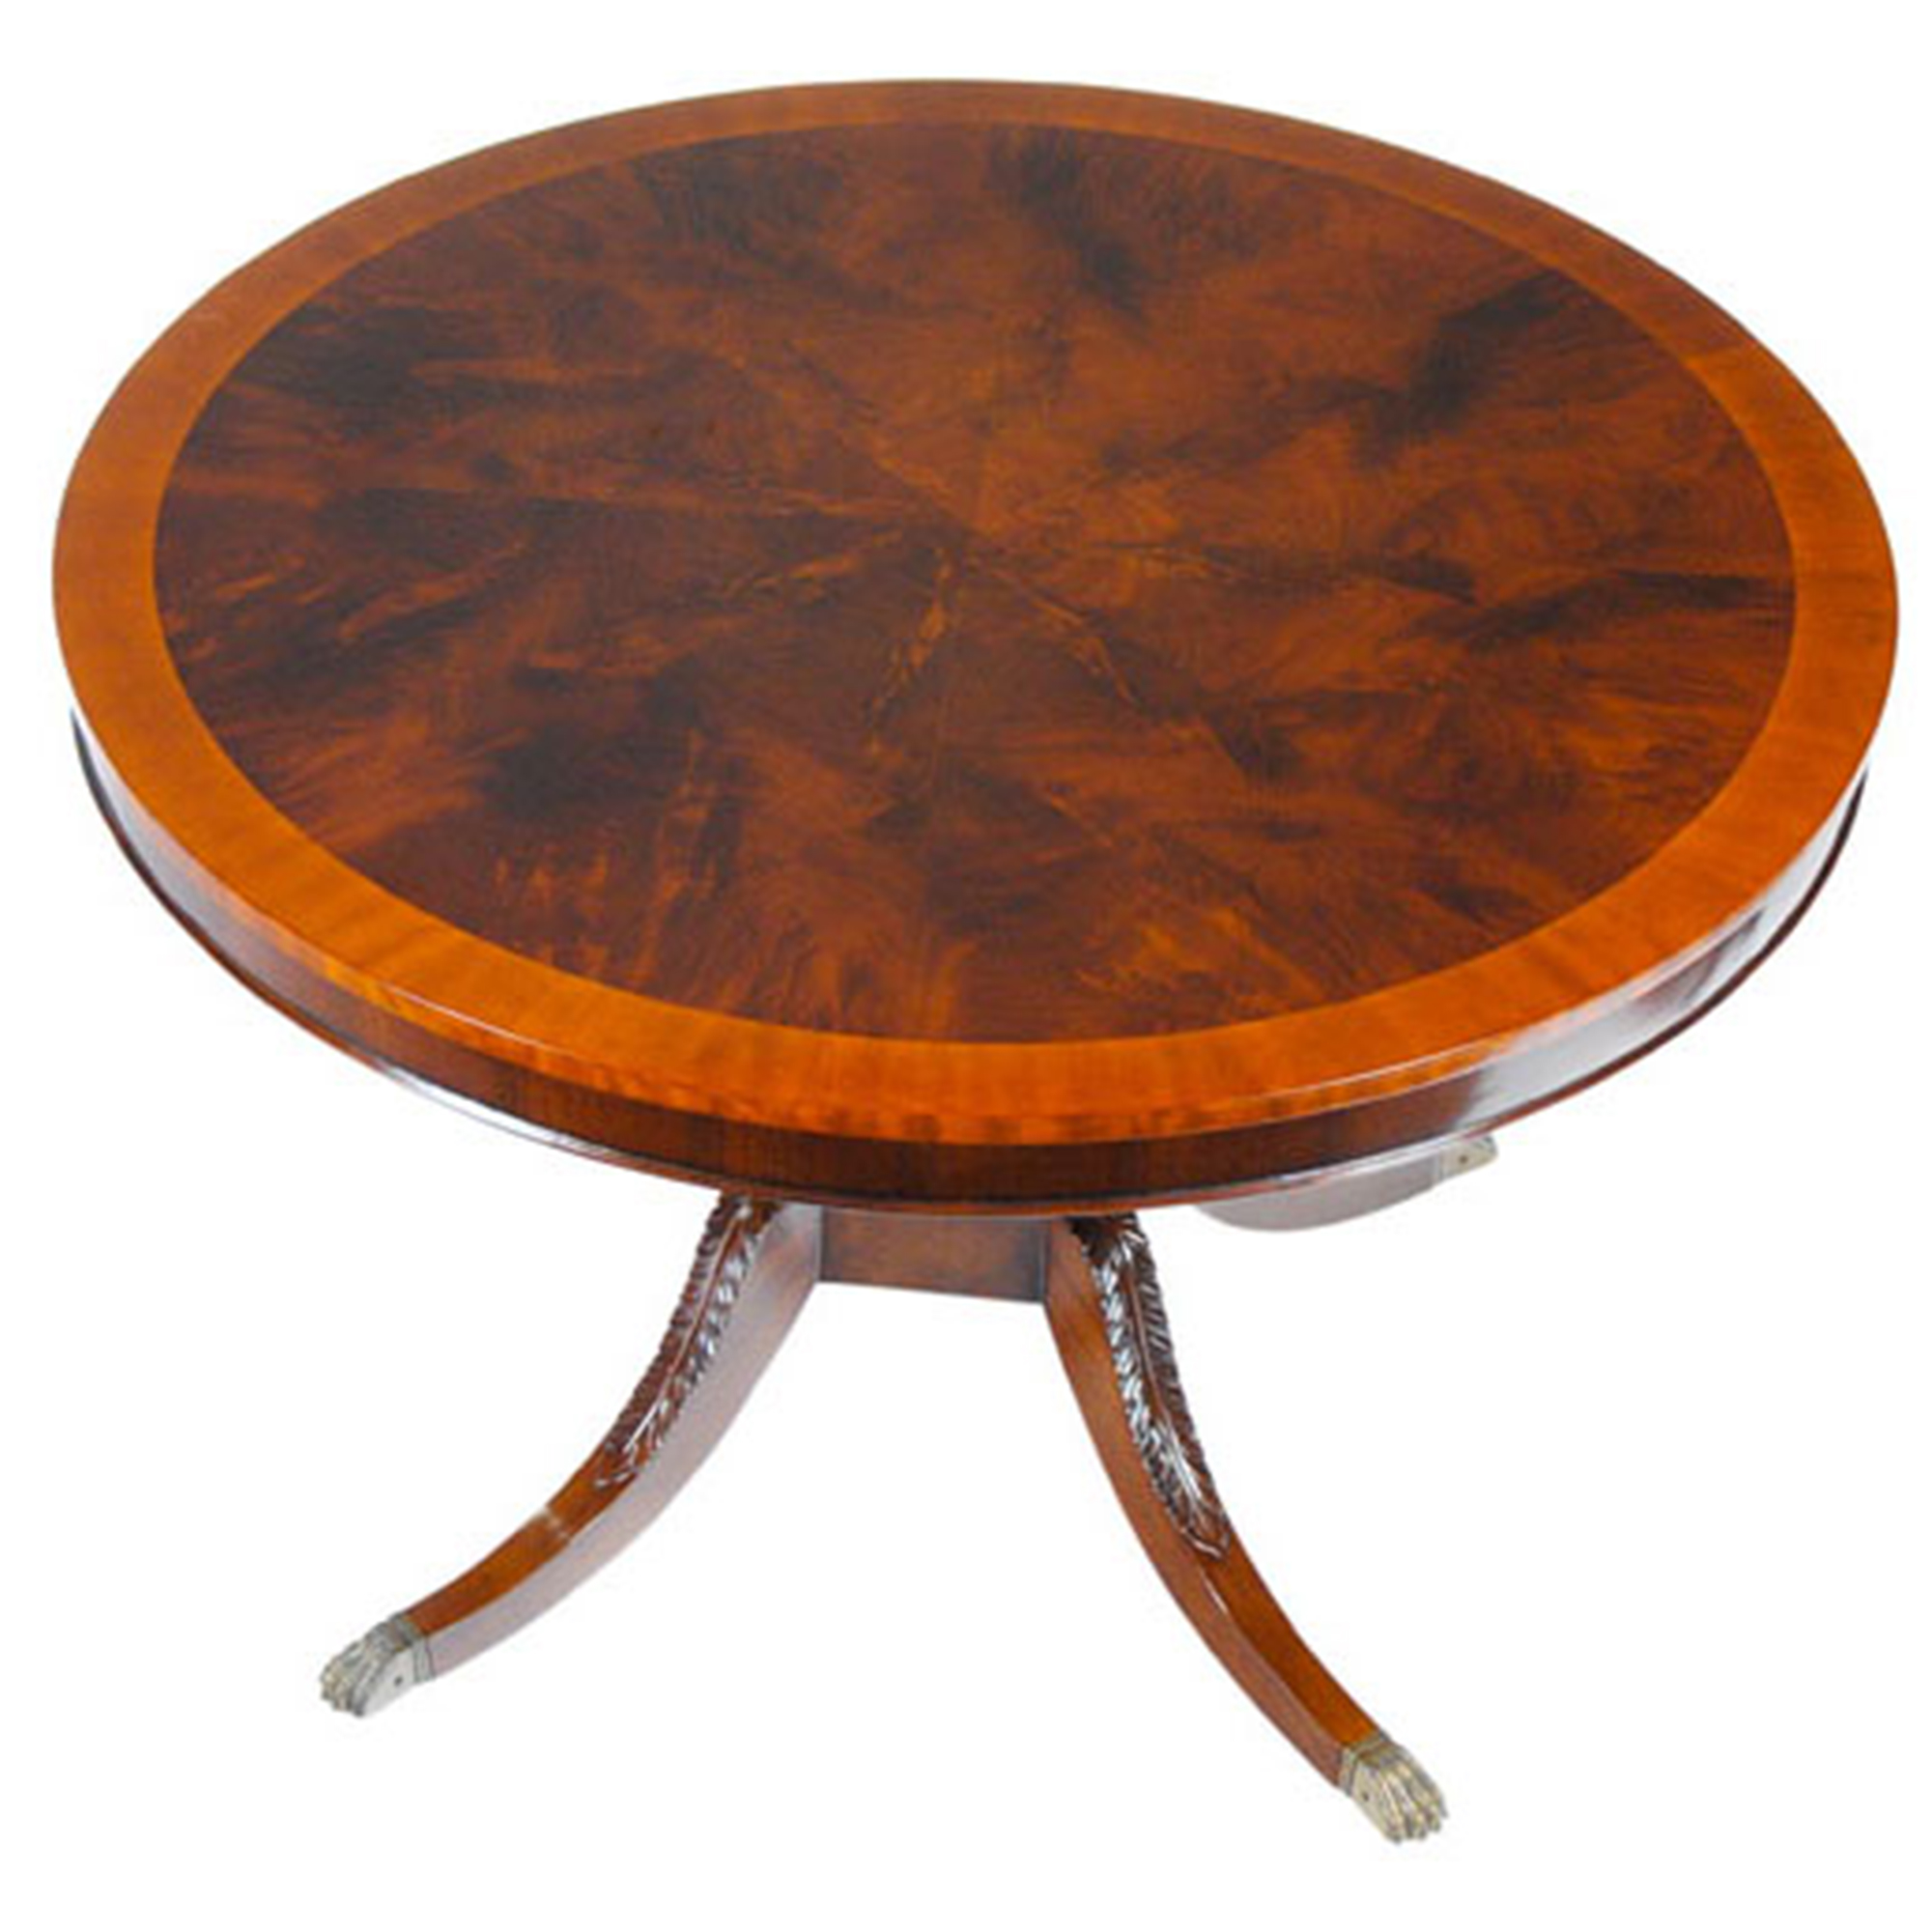 Harp Center Table Mahogany Round Table Niagara Furniture : NSI011 1 from niagarafurniture.com size 2000 x 2000 jpeg 845kB